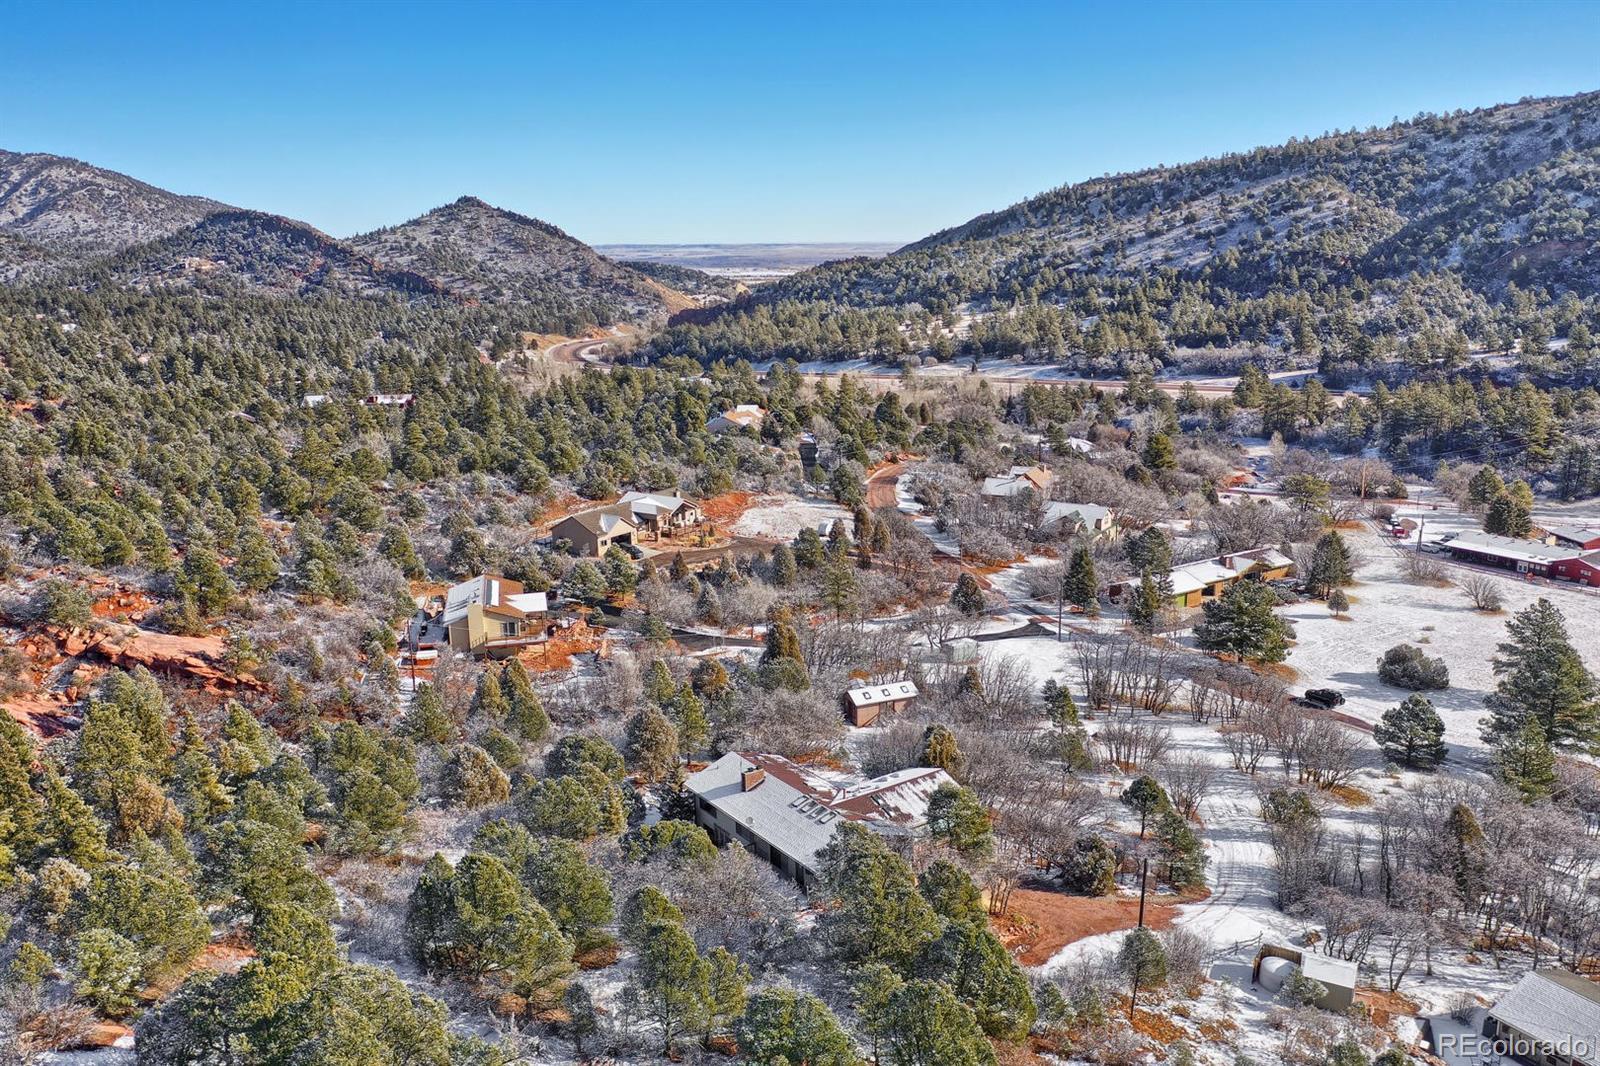 MLS# 2704020 - 2 - 11440 Valle Verde Drive, Colorado Springs, CO 80926